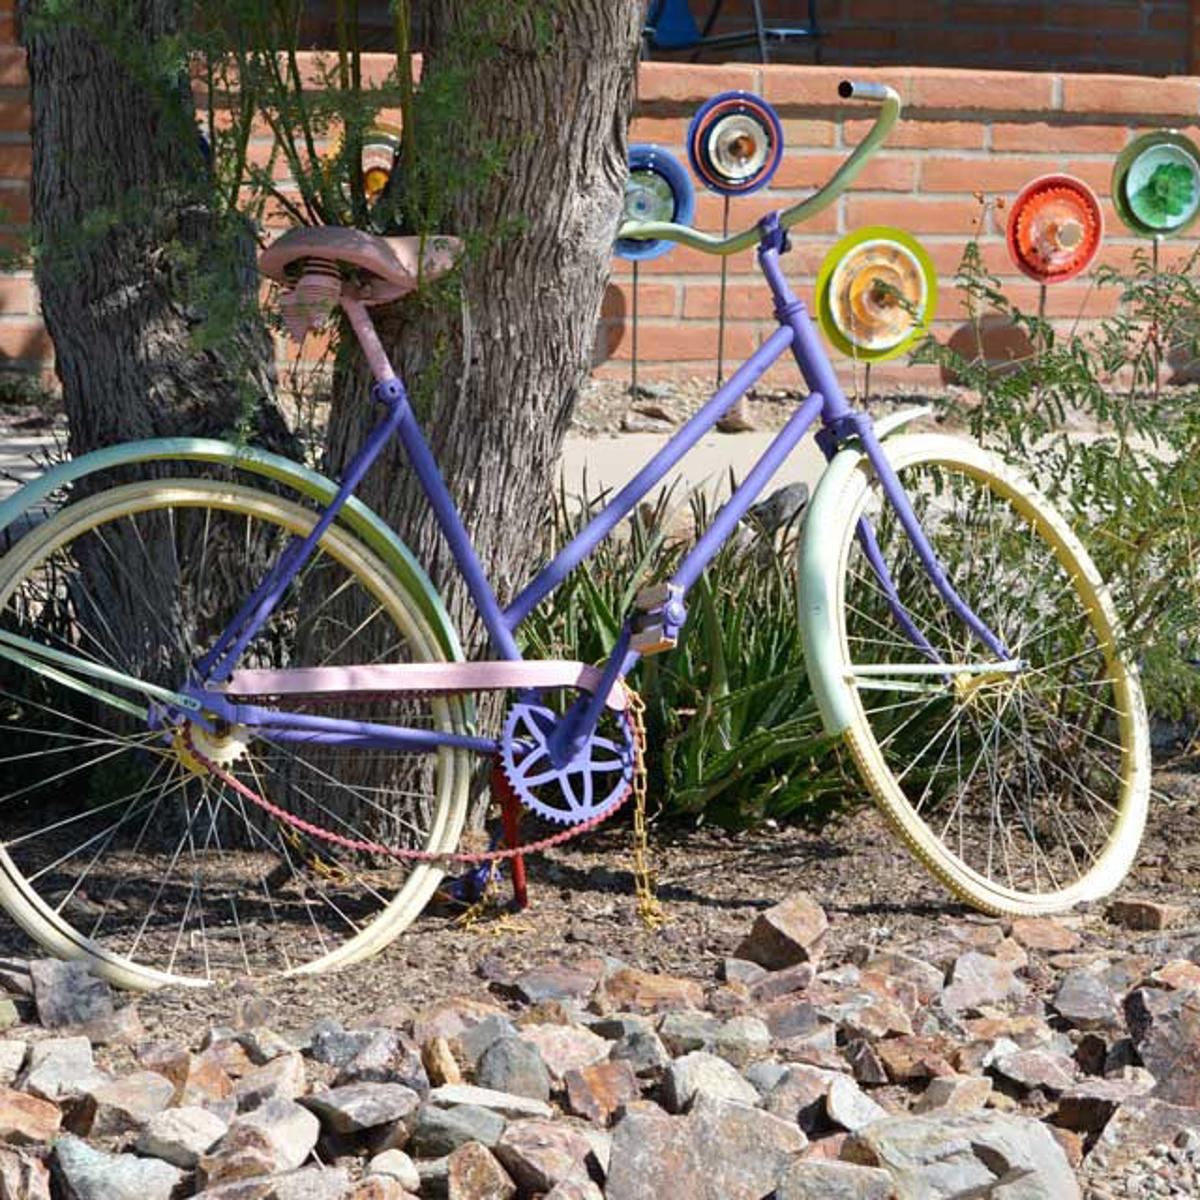 Tucson Craigslist Bicycles